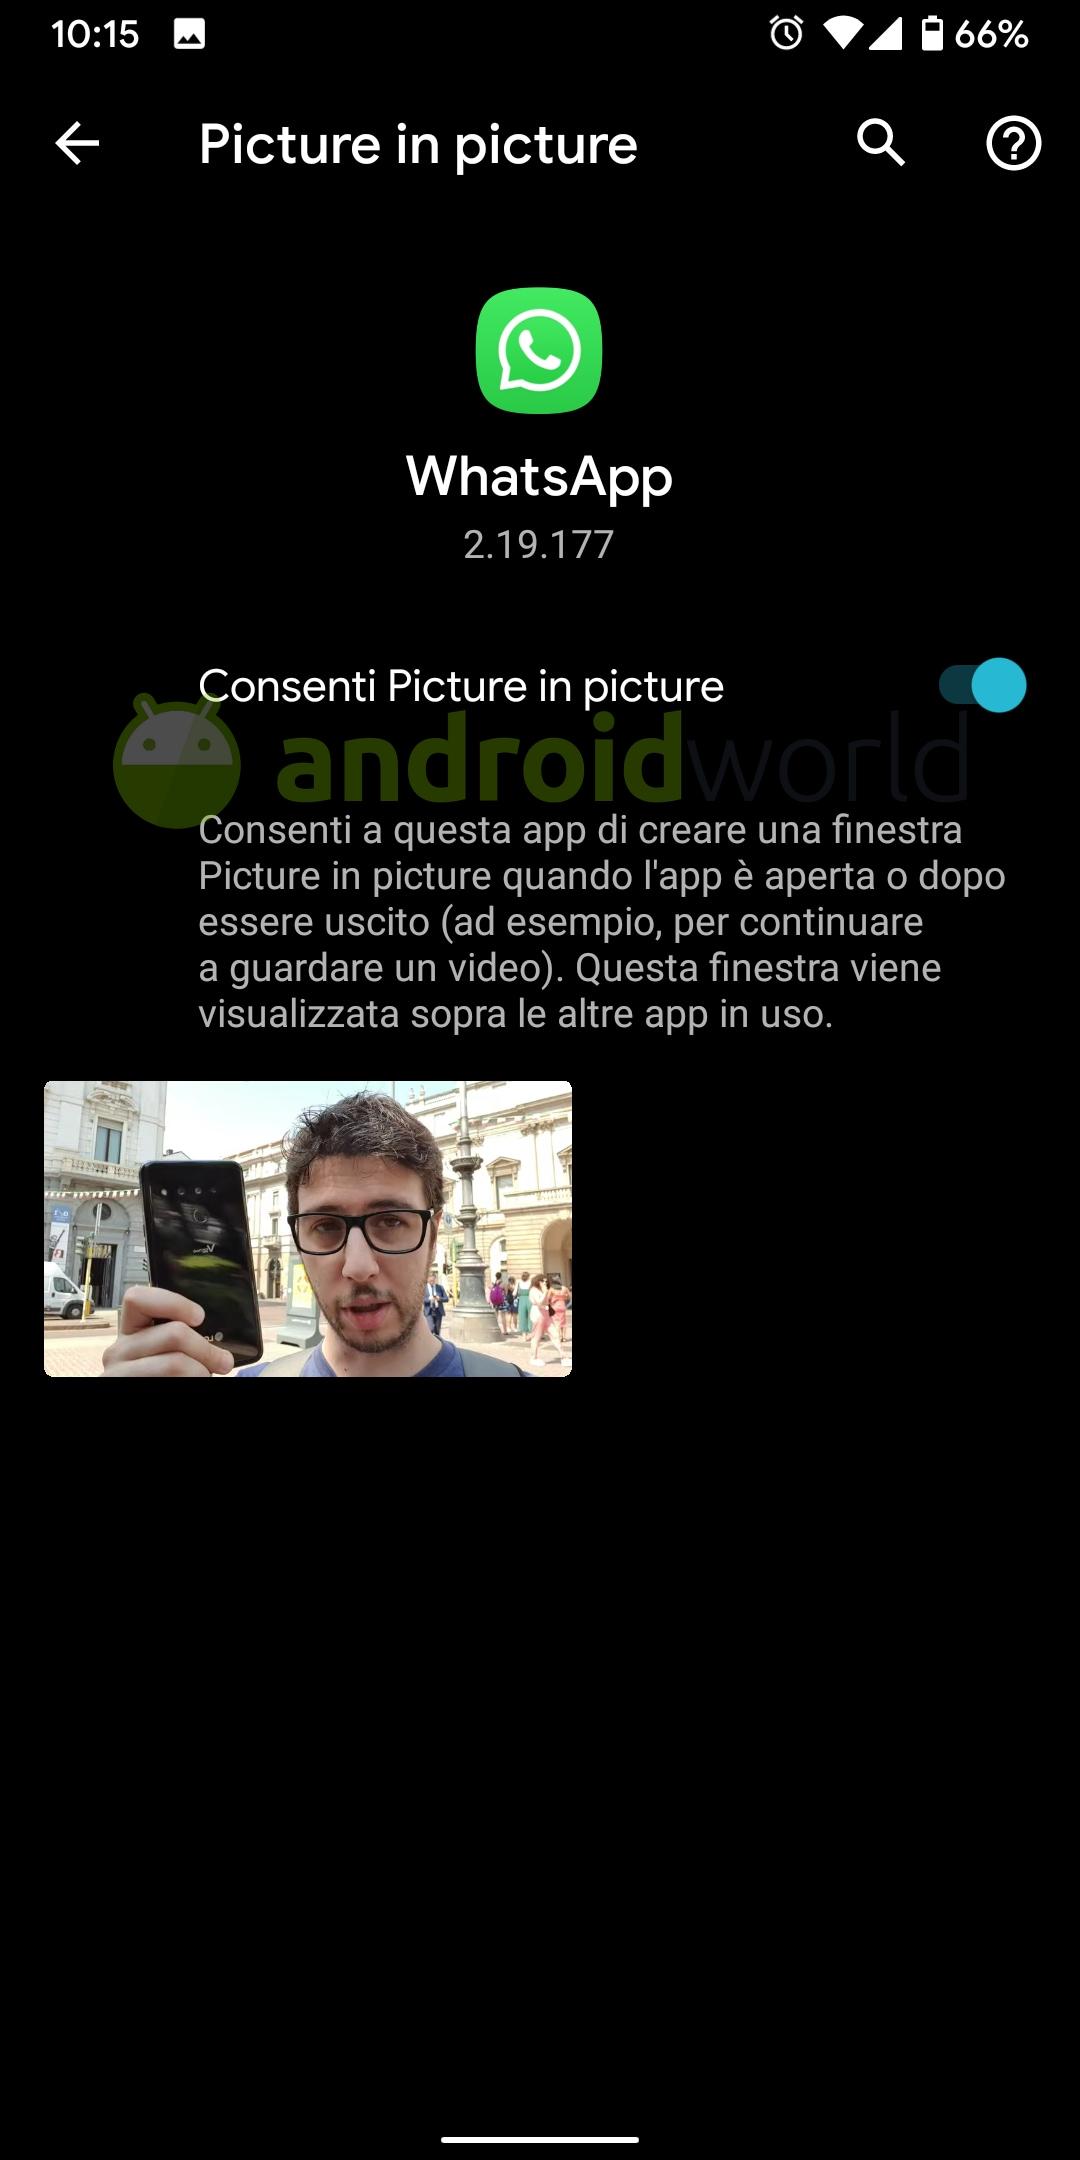 whatsapp-beta-picture-in-picture-01